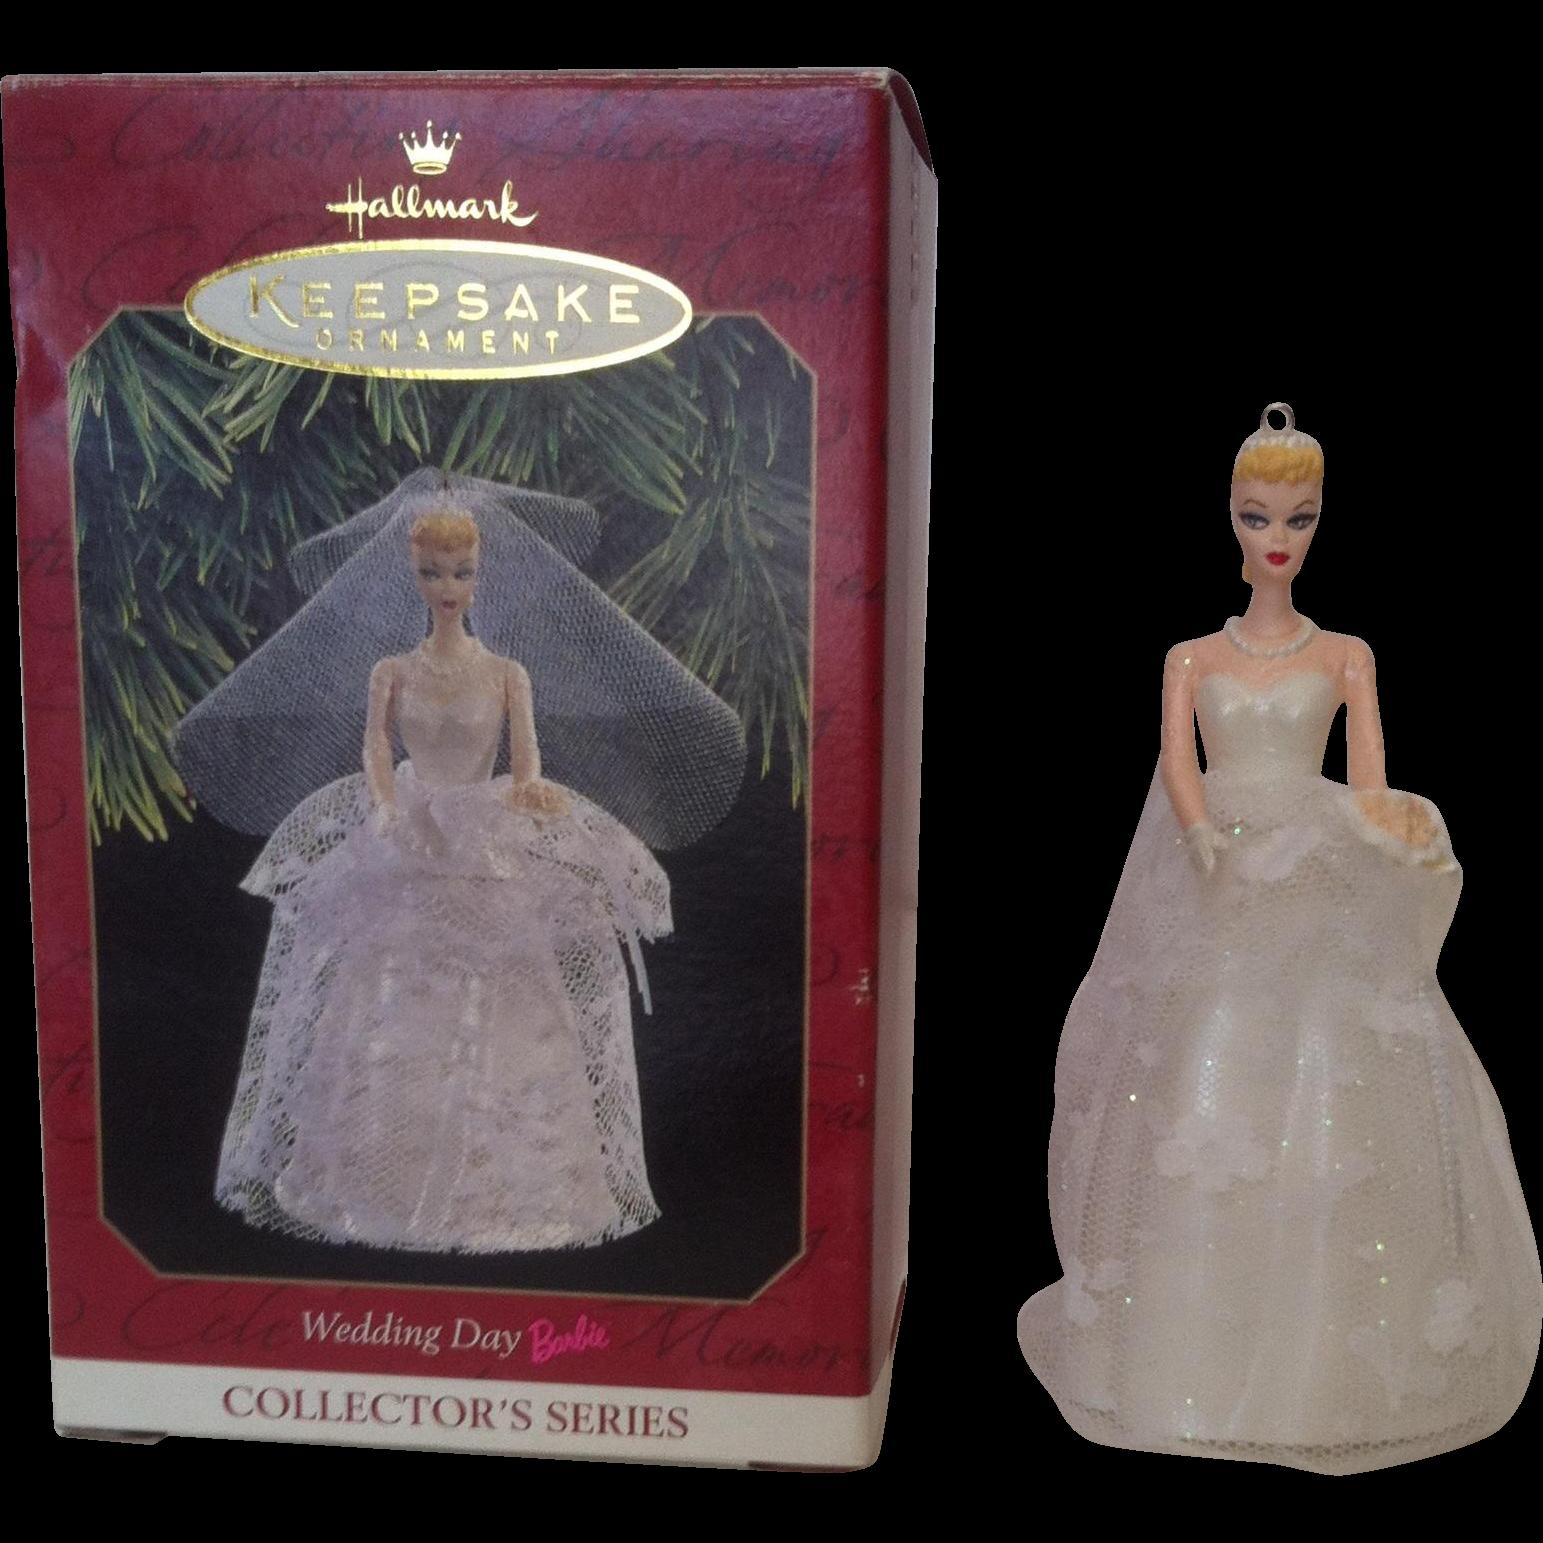 1997  Wedding Day Keepsake Ornament #4